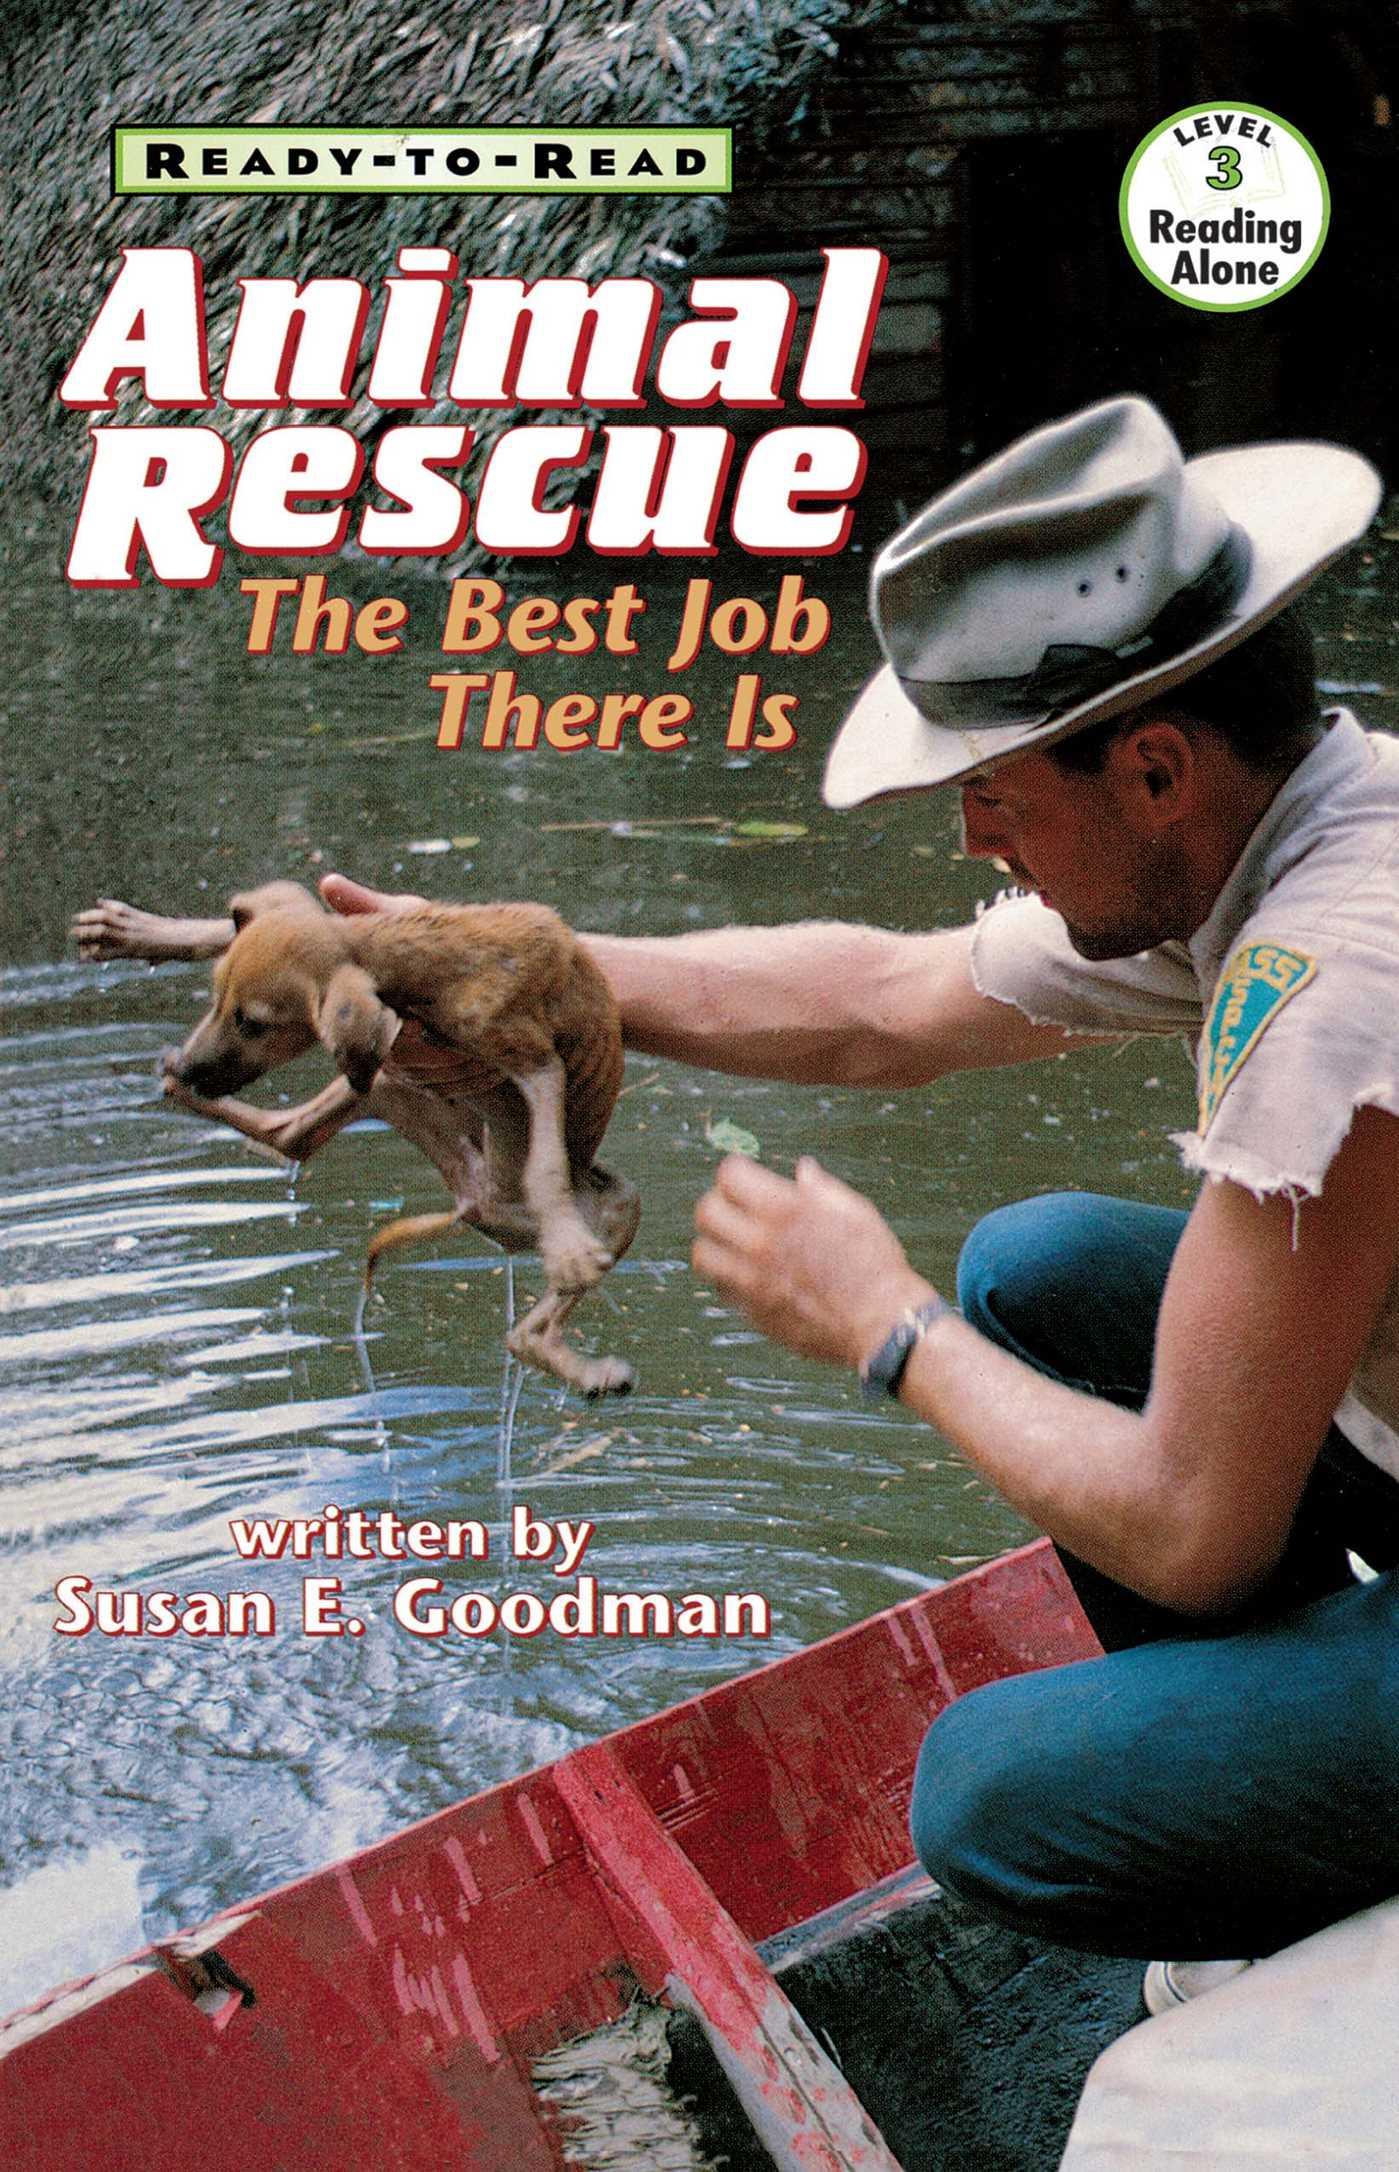 Animal rescue 9780689817953 hr